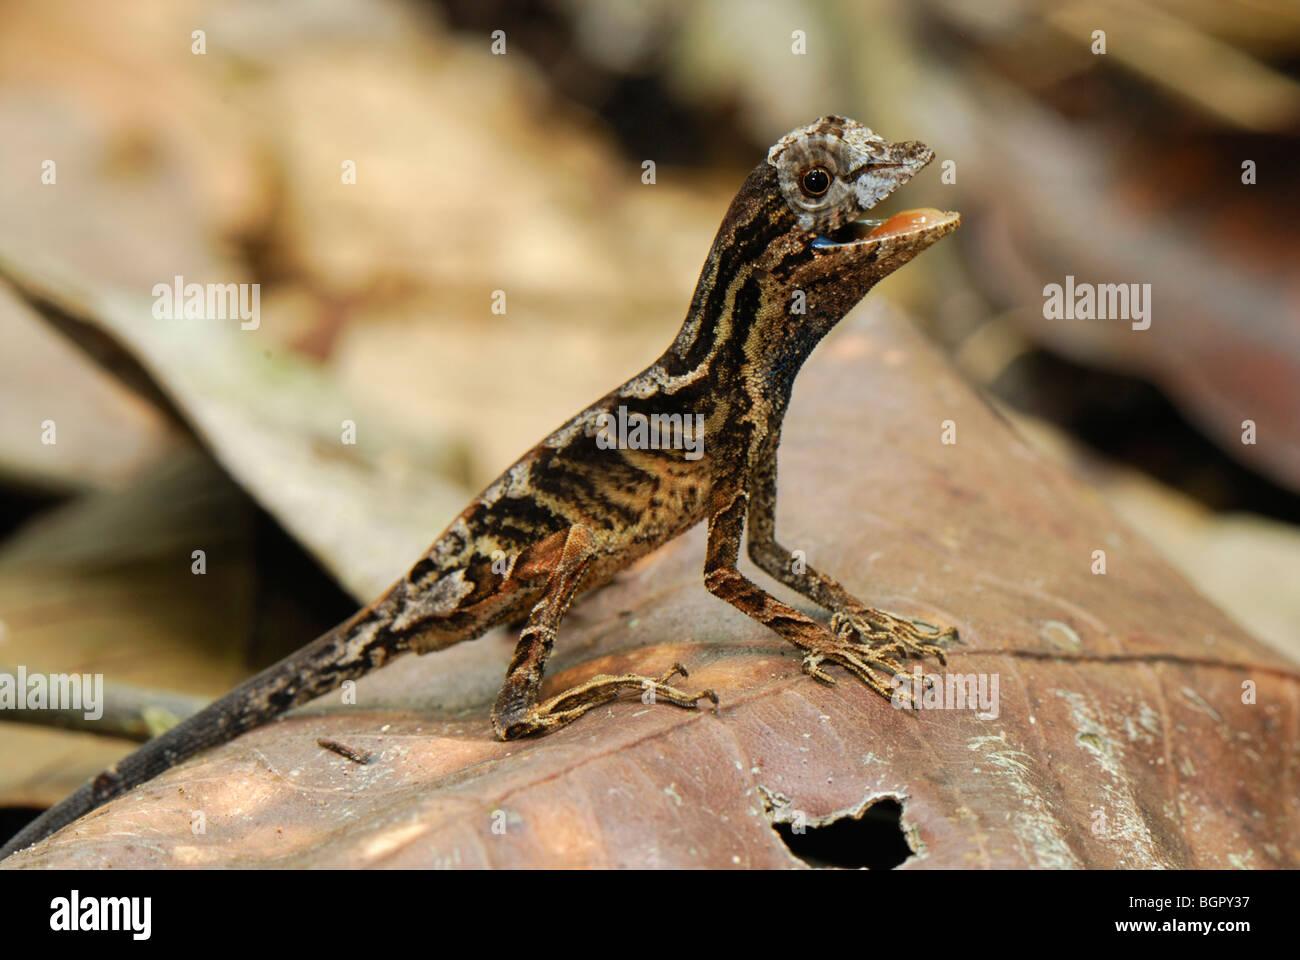 Anolis Lizard (Anolis nitens), adult, Allpahuayo Mishana National Reserve, Iquitos, Peru - Stock Image